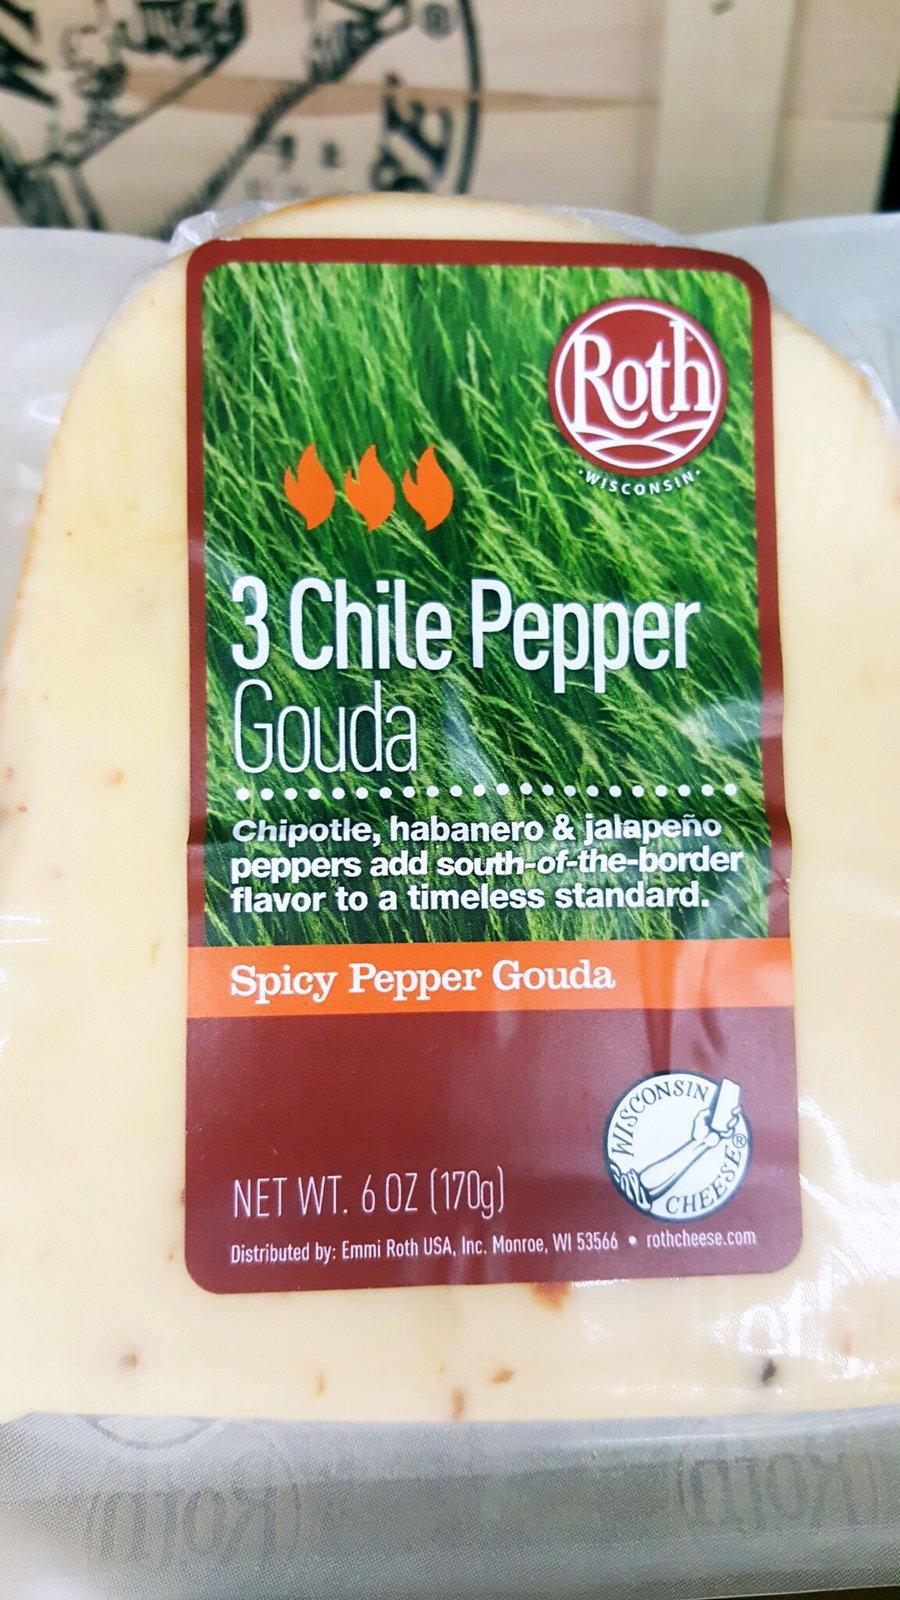 Oct 17 Roth 3 Chile Pepper Gouda cheese.jpg